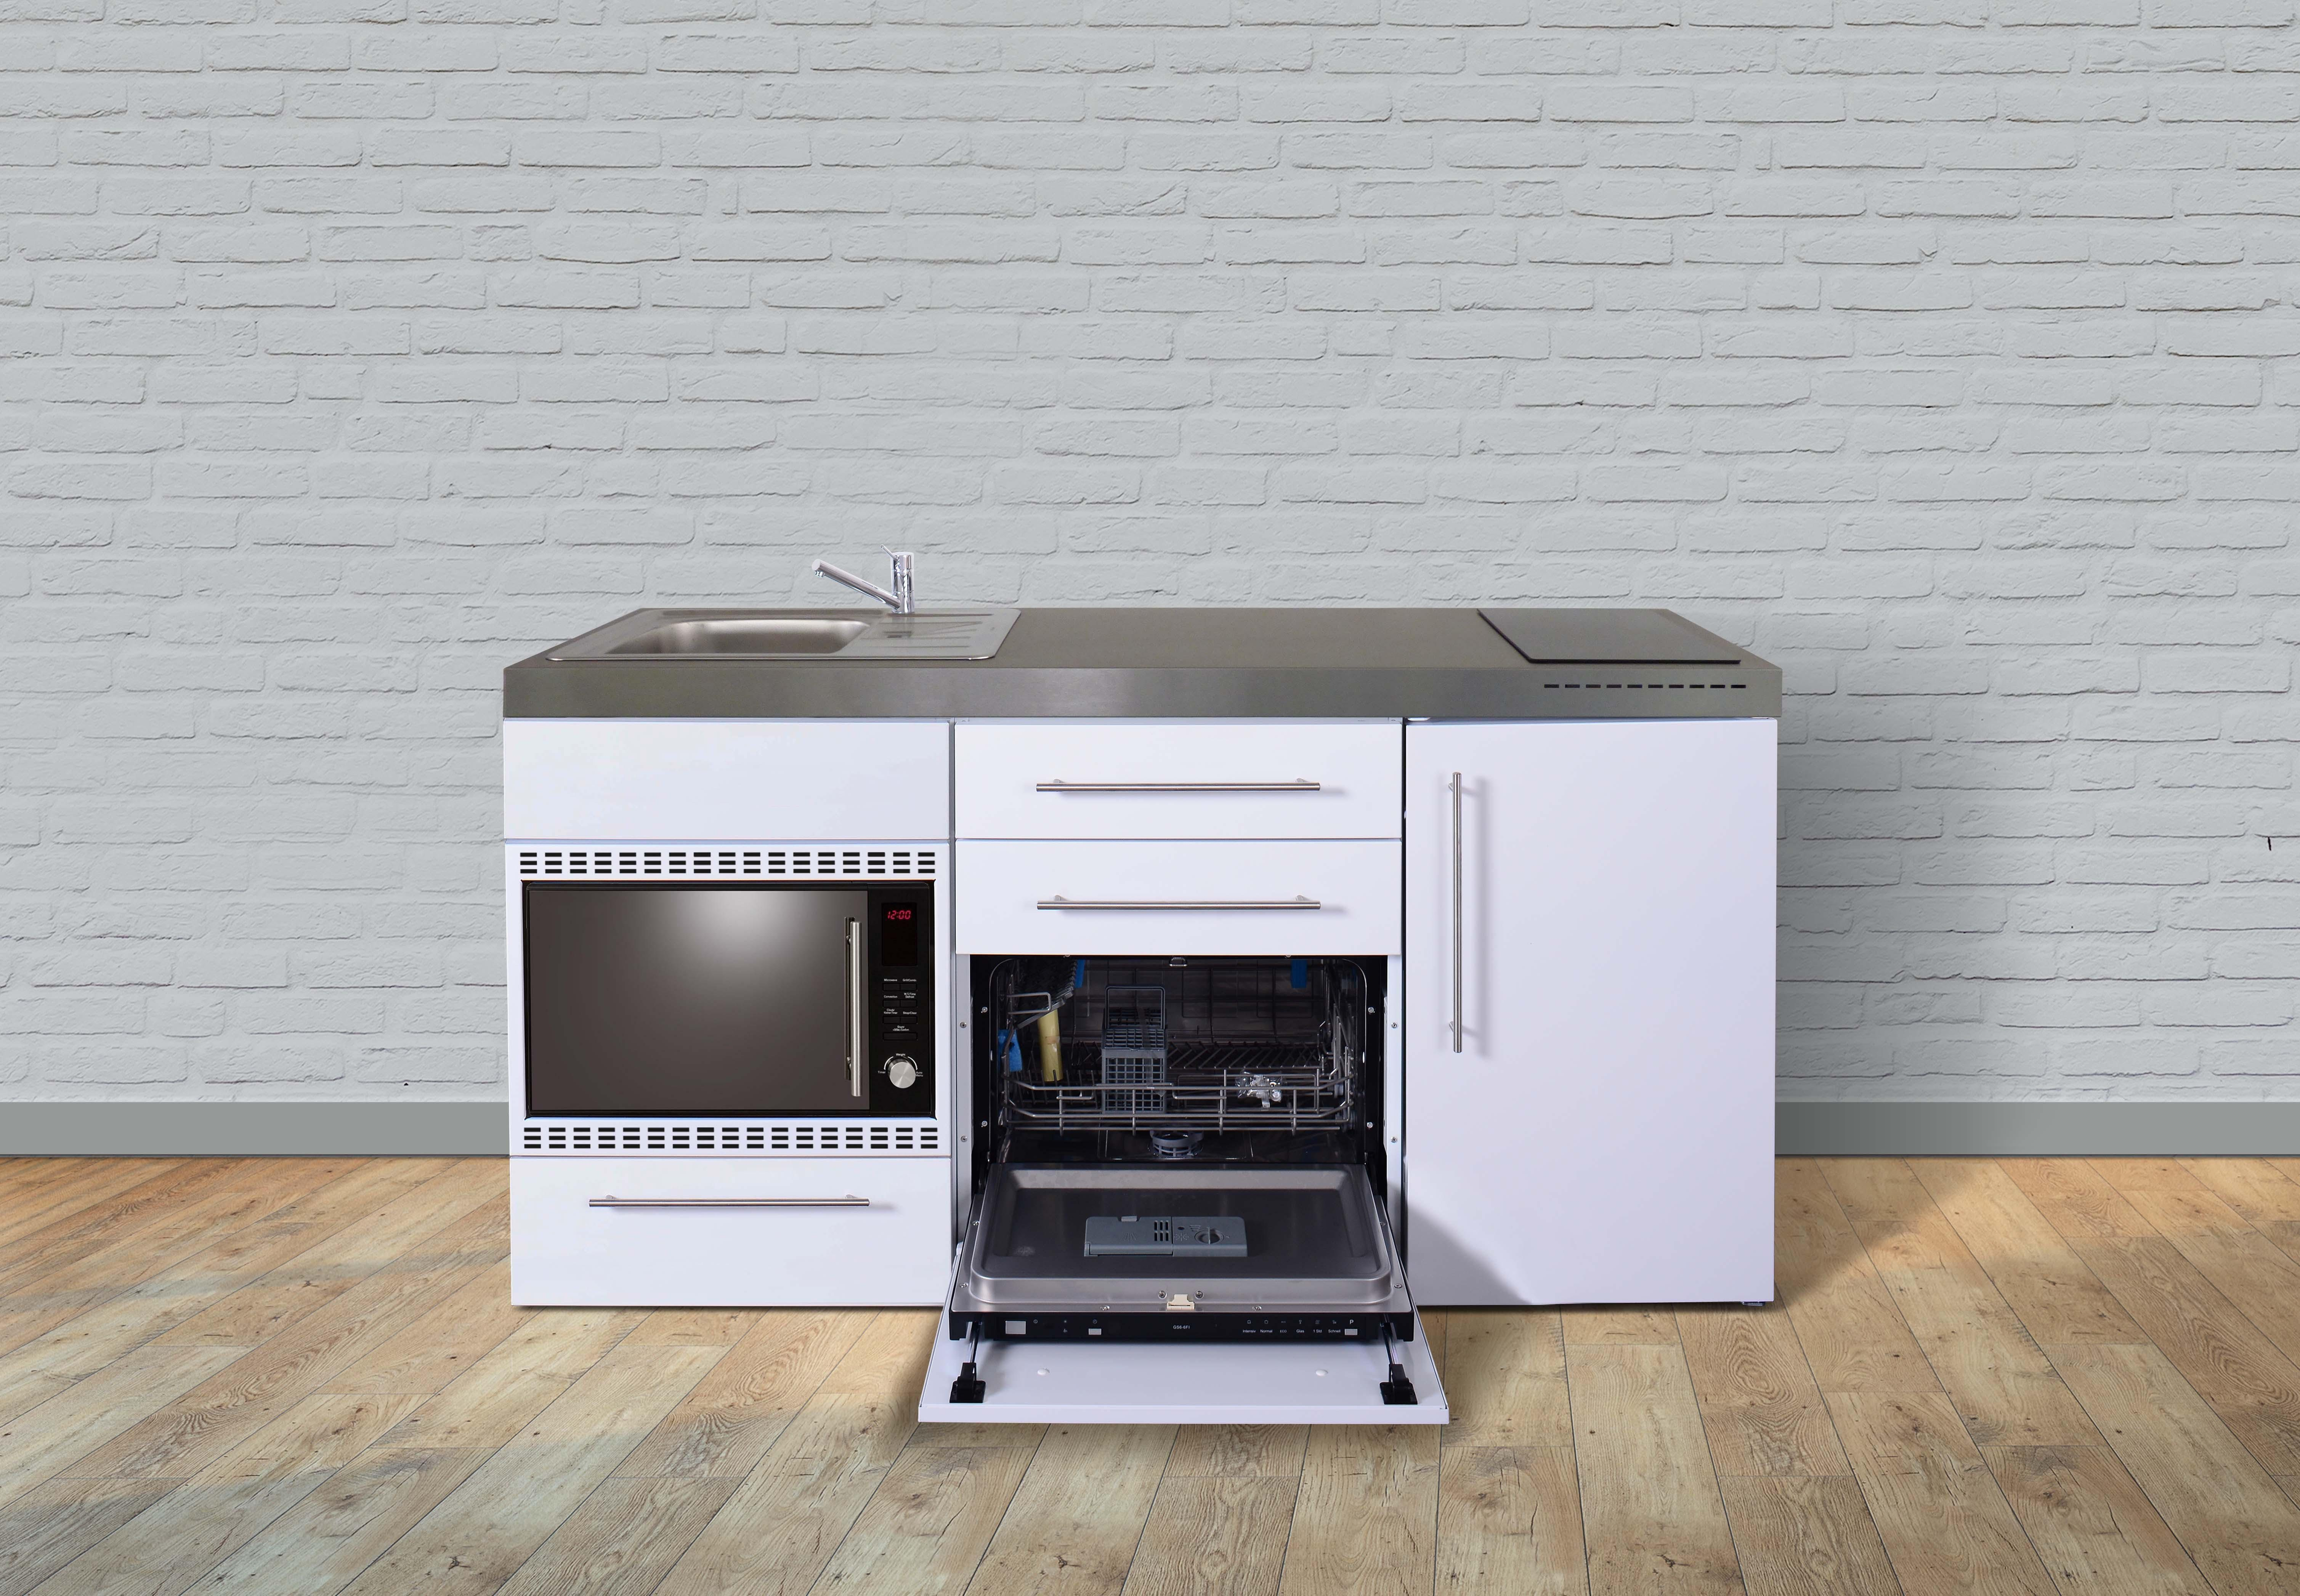 Mini Küchenzeile Mit Kühlschrank : Ikea mini küche mini kuche ikea gallery of sehr gute ideen mini